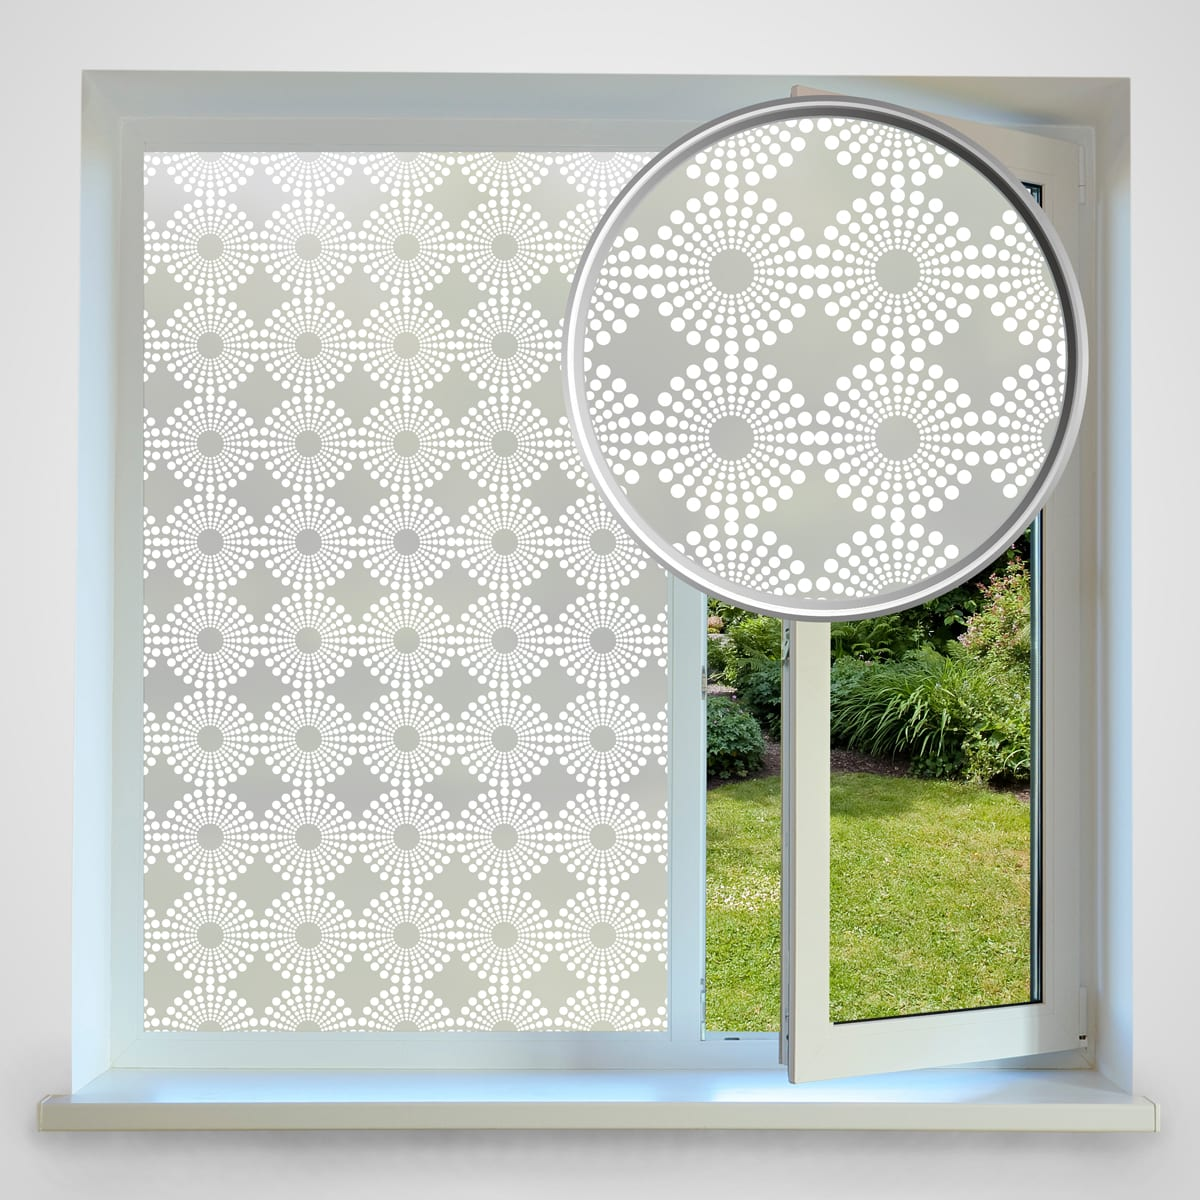 Florence Privacy Window Film Abodewindowfilms Co Uk